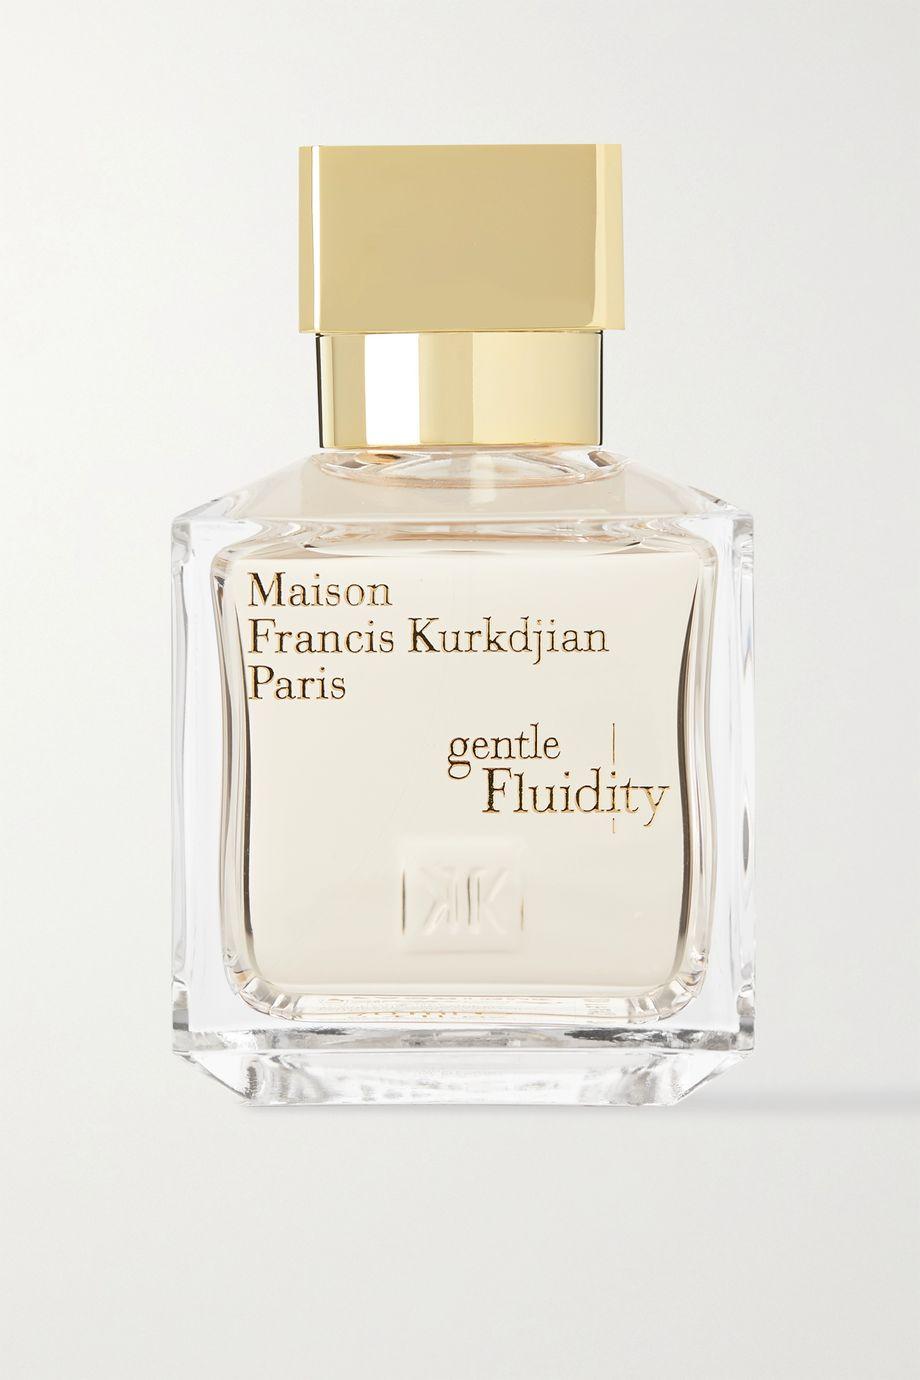 Maison Francis Kurkdjian Eau de Parfum - Gentle Fluidity Gold Edition, 70ml